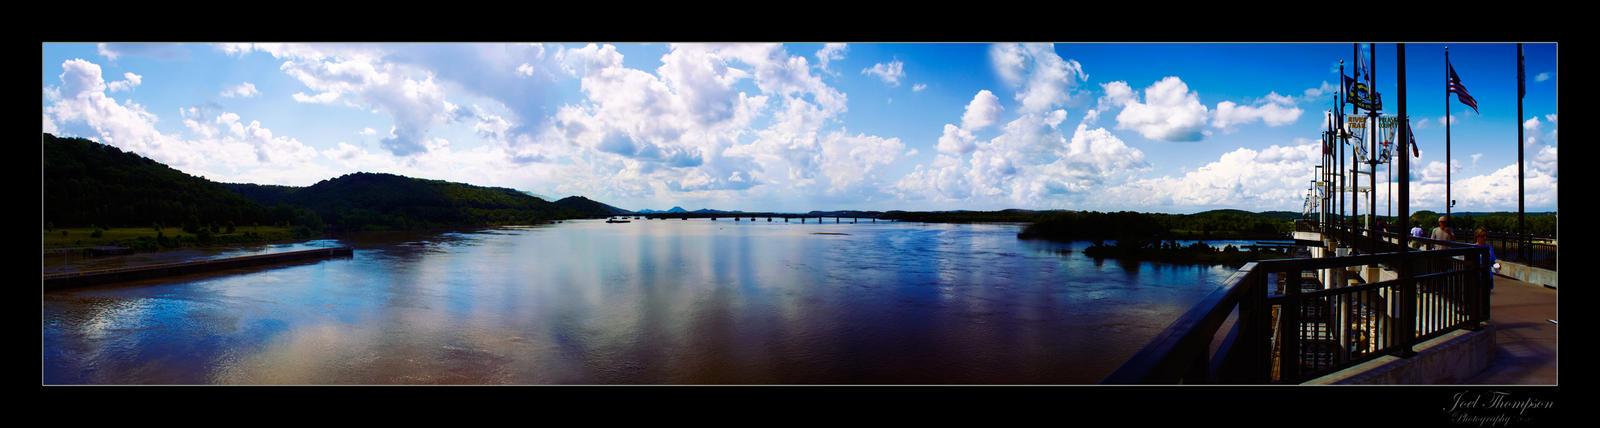 Arkansas River Damorama by joelht74